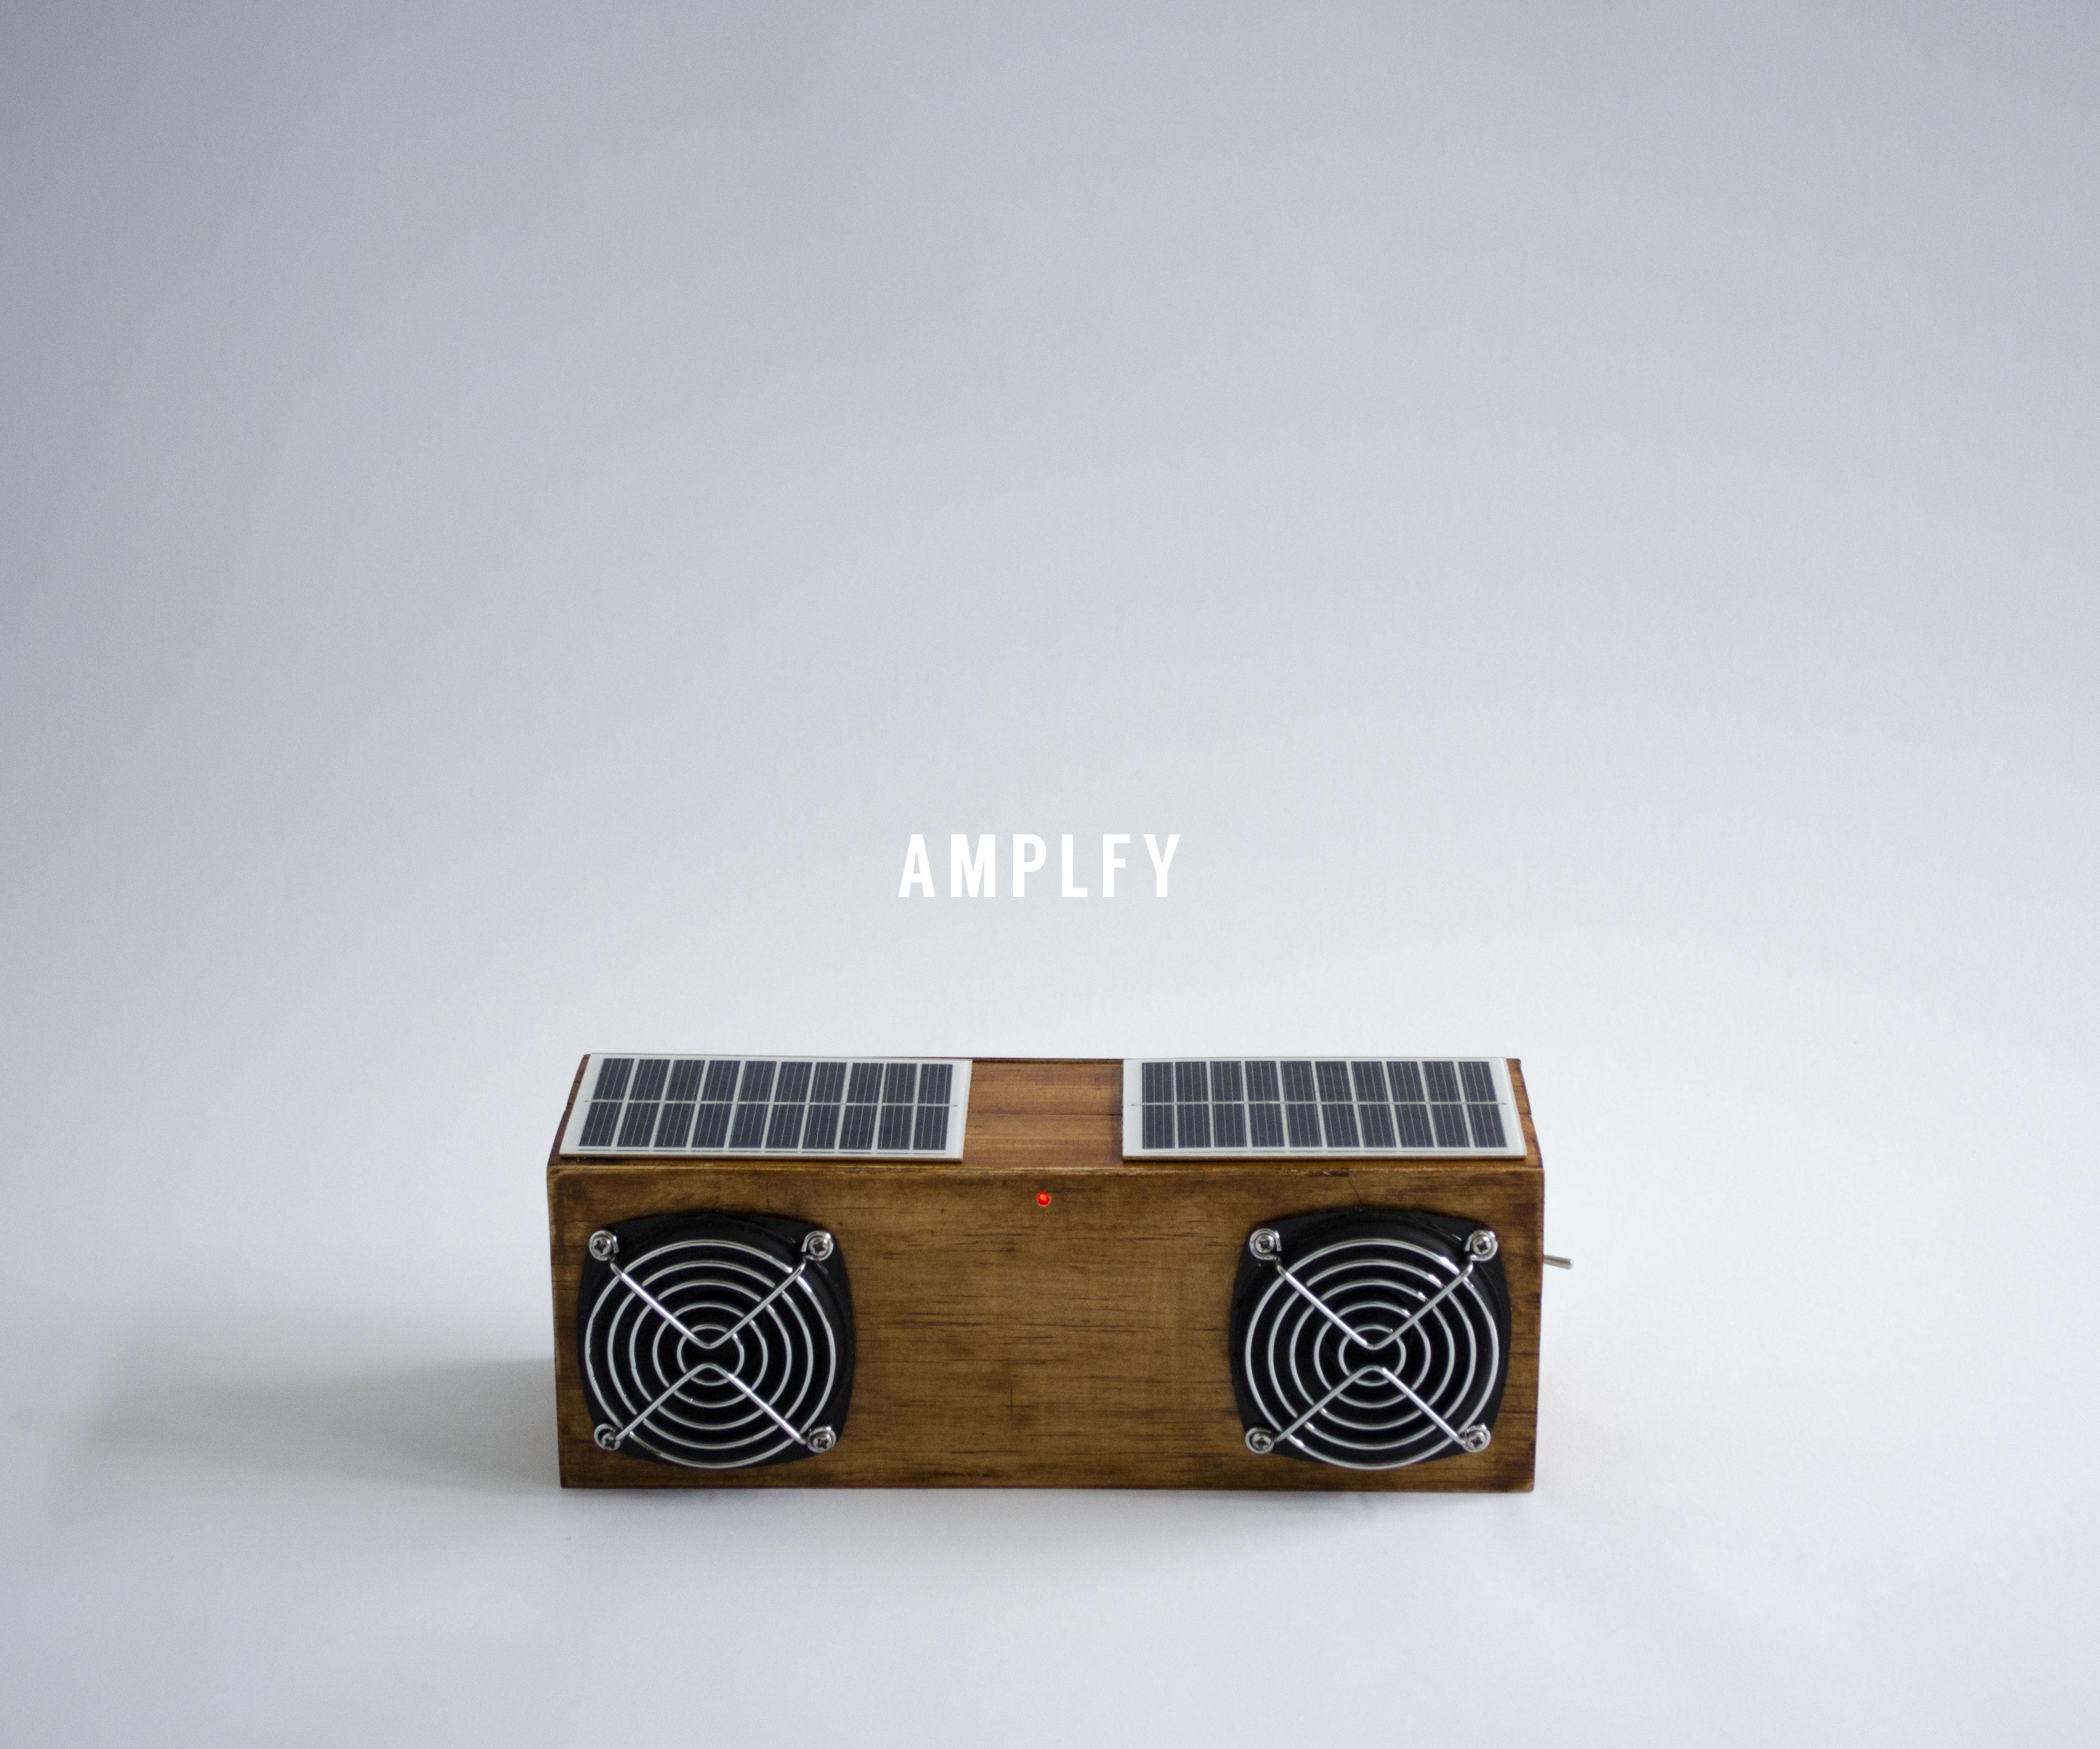 AMPLFY Mini DIY Portable Speaker - Solar / Bluetooth / Flash Light / Phone Charger